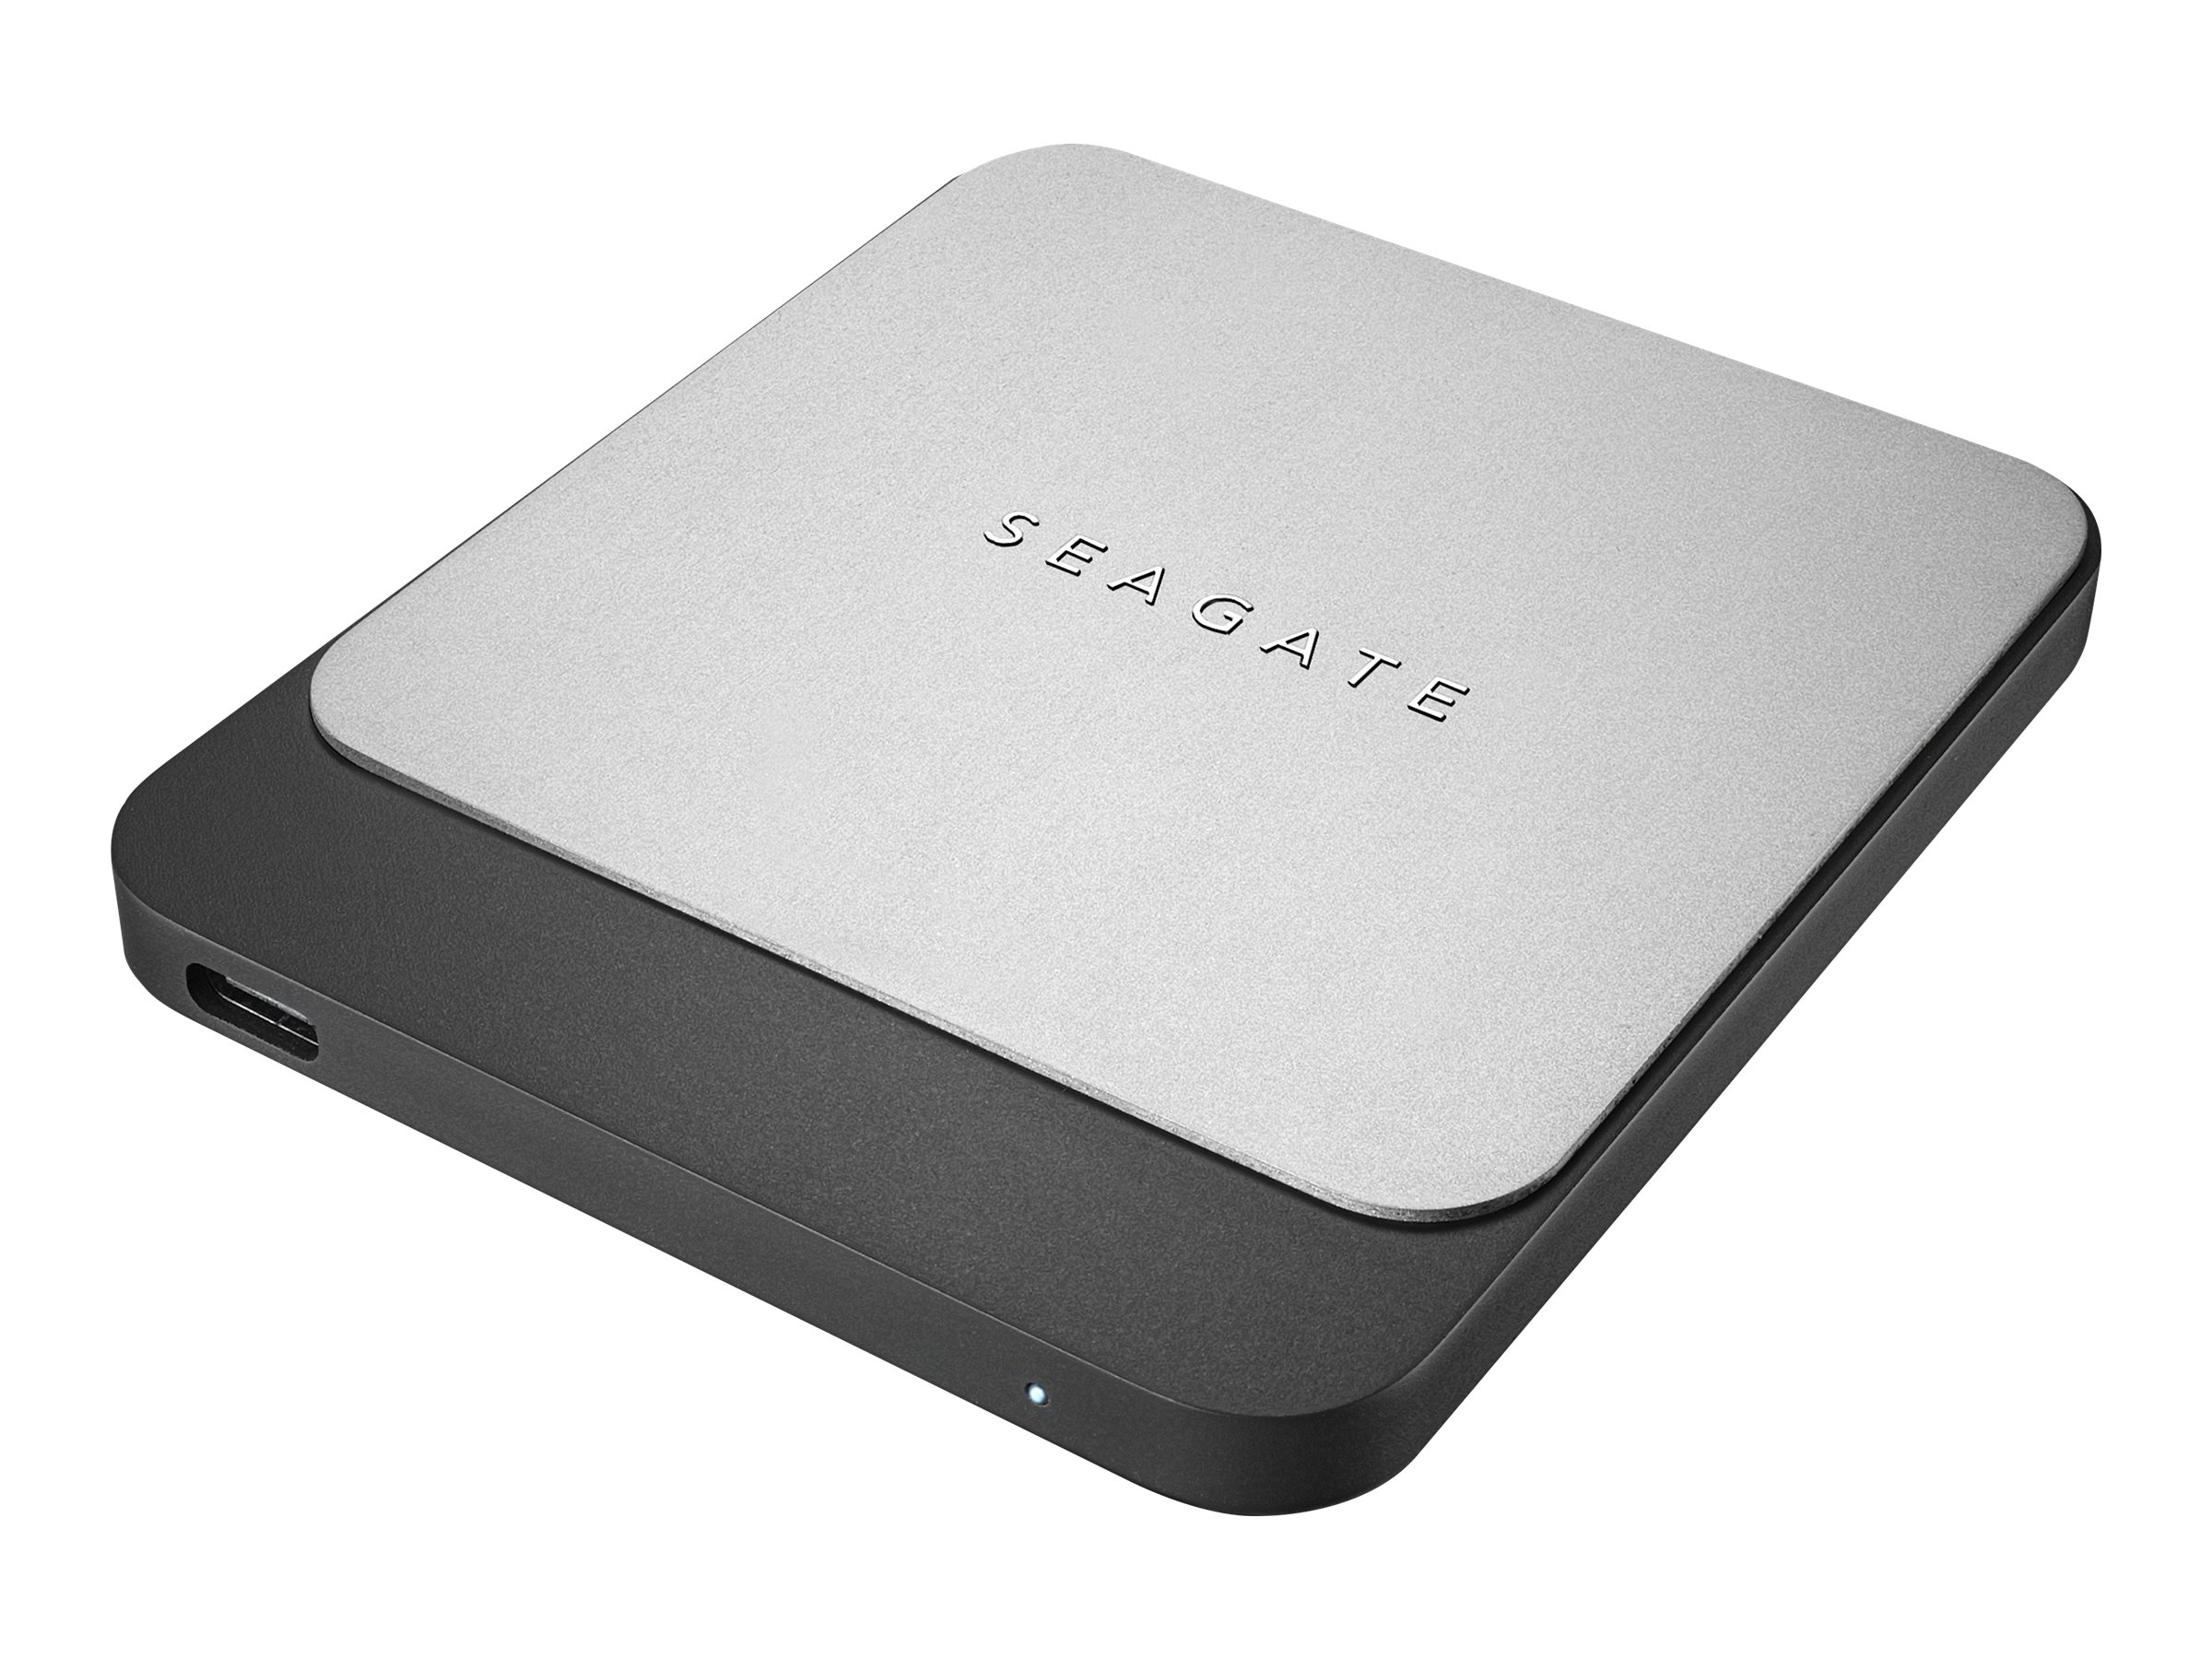 Seagate Fast STCM500401 - Solid-State-Disk - 500 GB - extern (tragbar) - USB 3.0 (USB-C Steckverbinder) - Schwarz